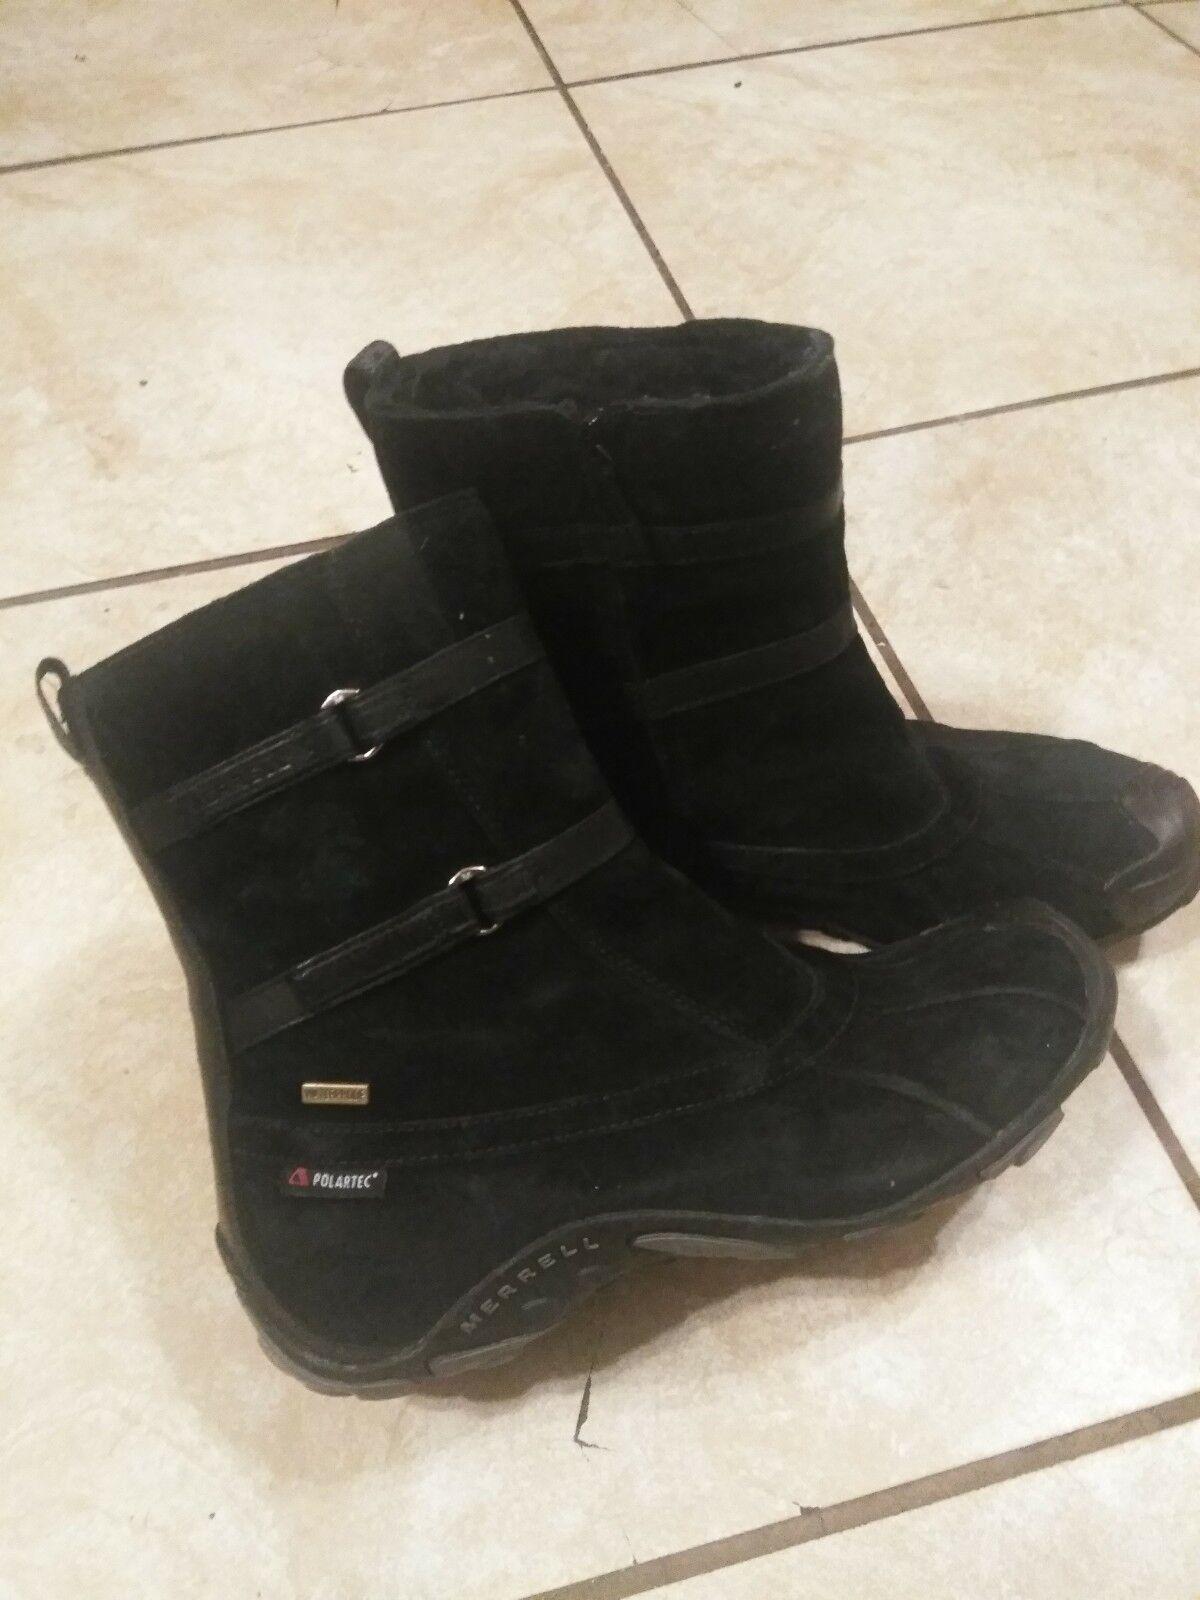 Merrell polartec Women Boots 8.5